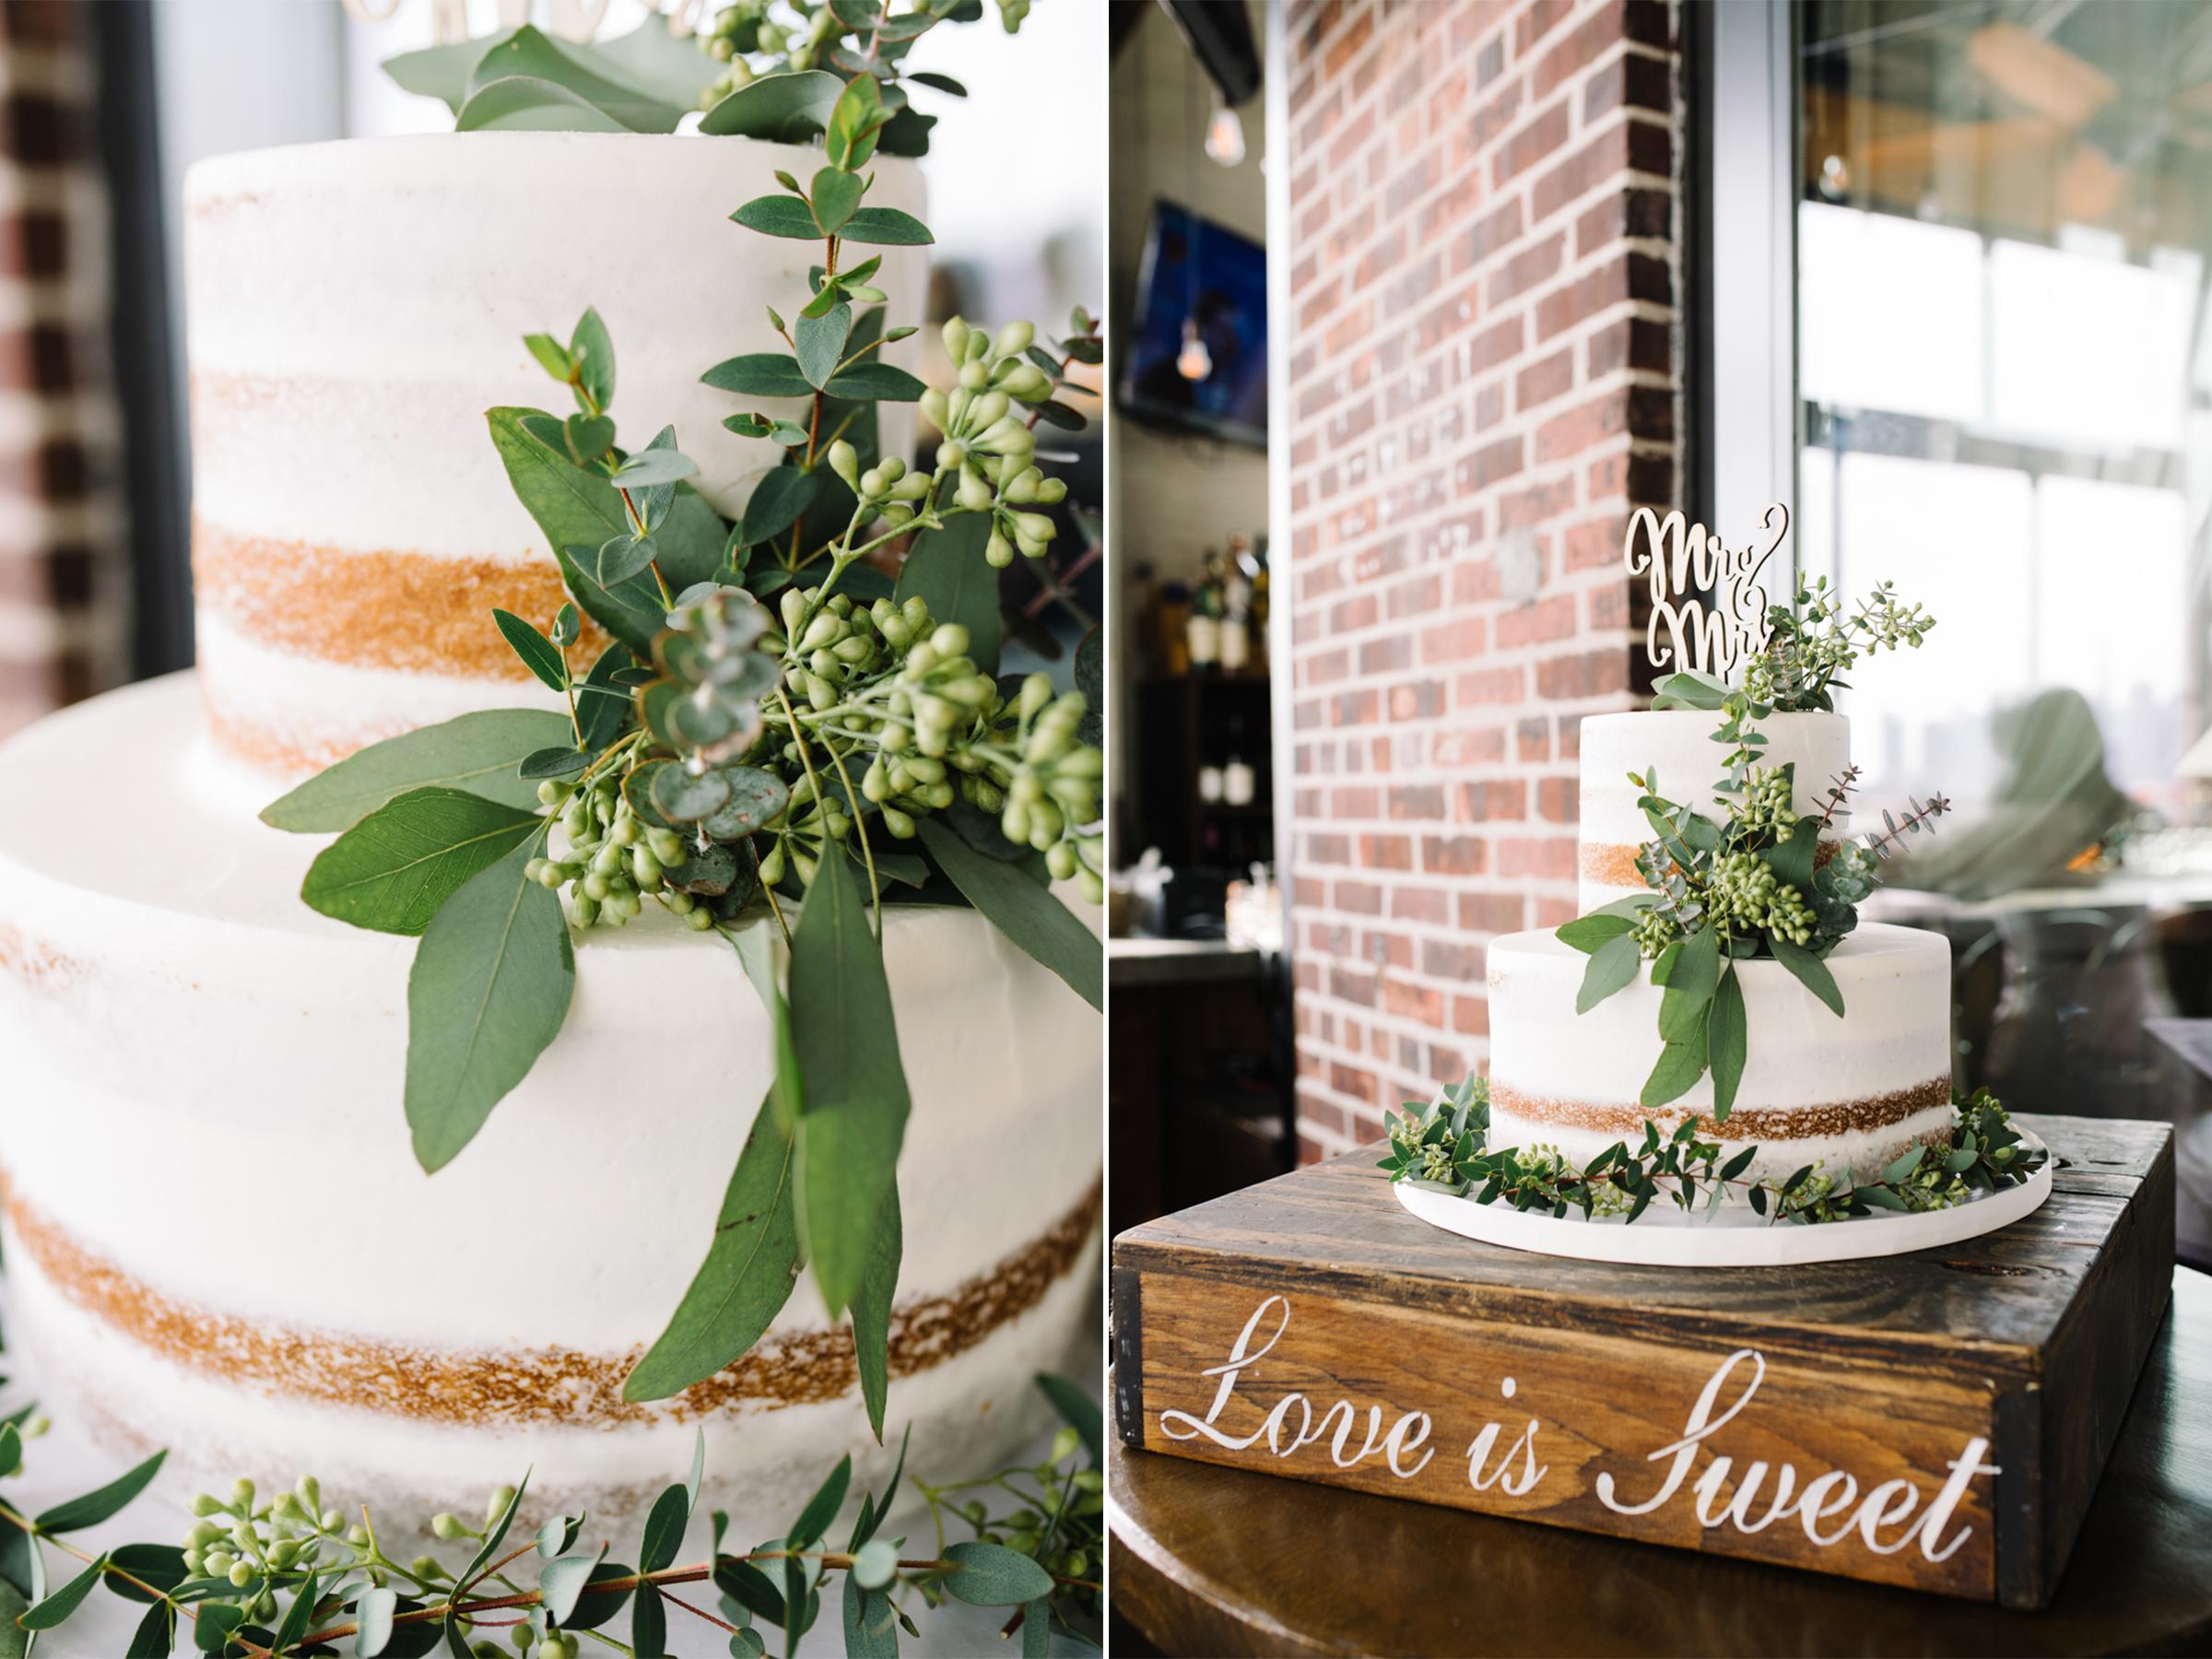 City Hall Wedding- Nichole + Lukasz-Cake Dulce de Leche- Jersey City New Jersey- Olivia Christina Photo.jpg